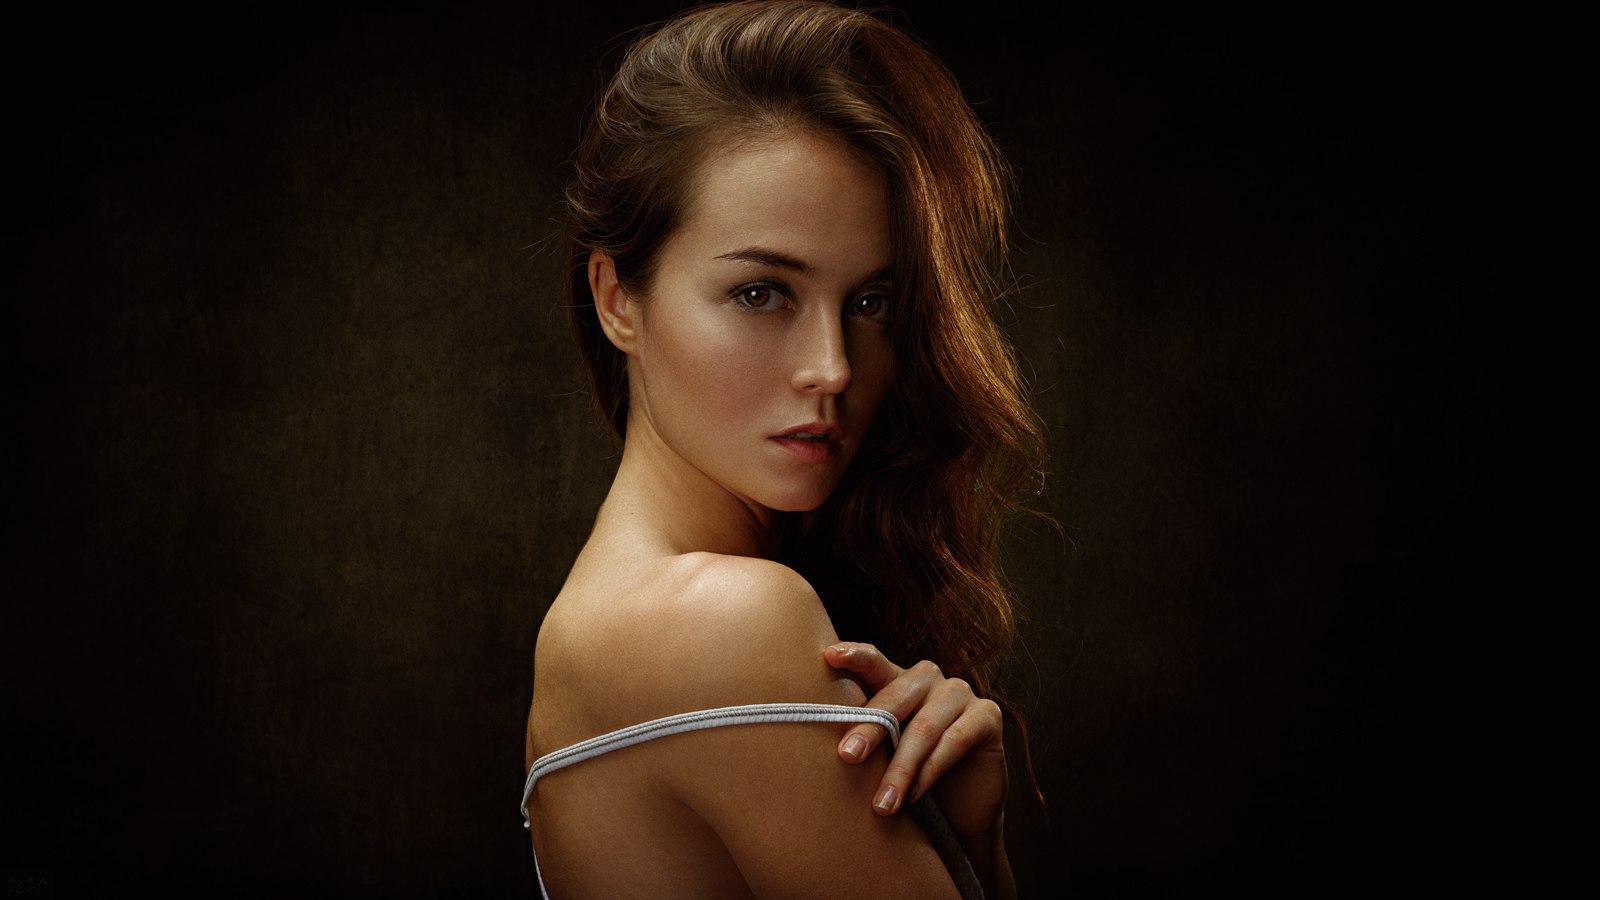 Wallpaper Face Women Simple Background Long Hair: Wallpaper : Women, Brunette, Simple Background, Face